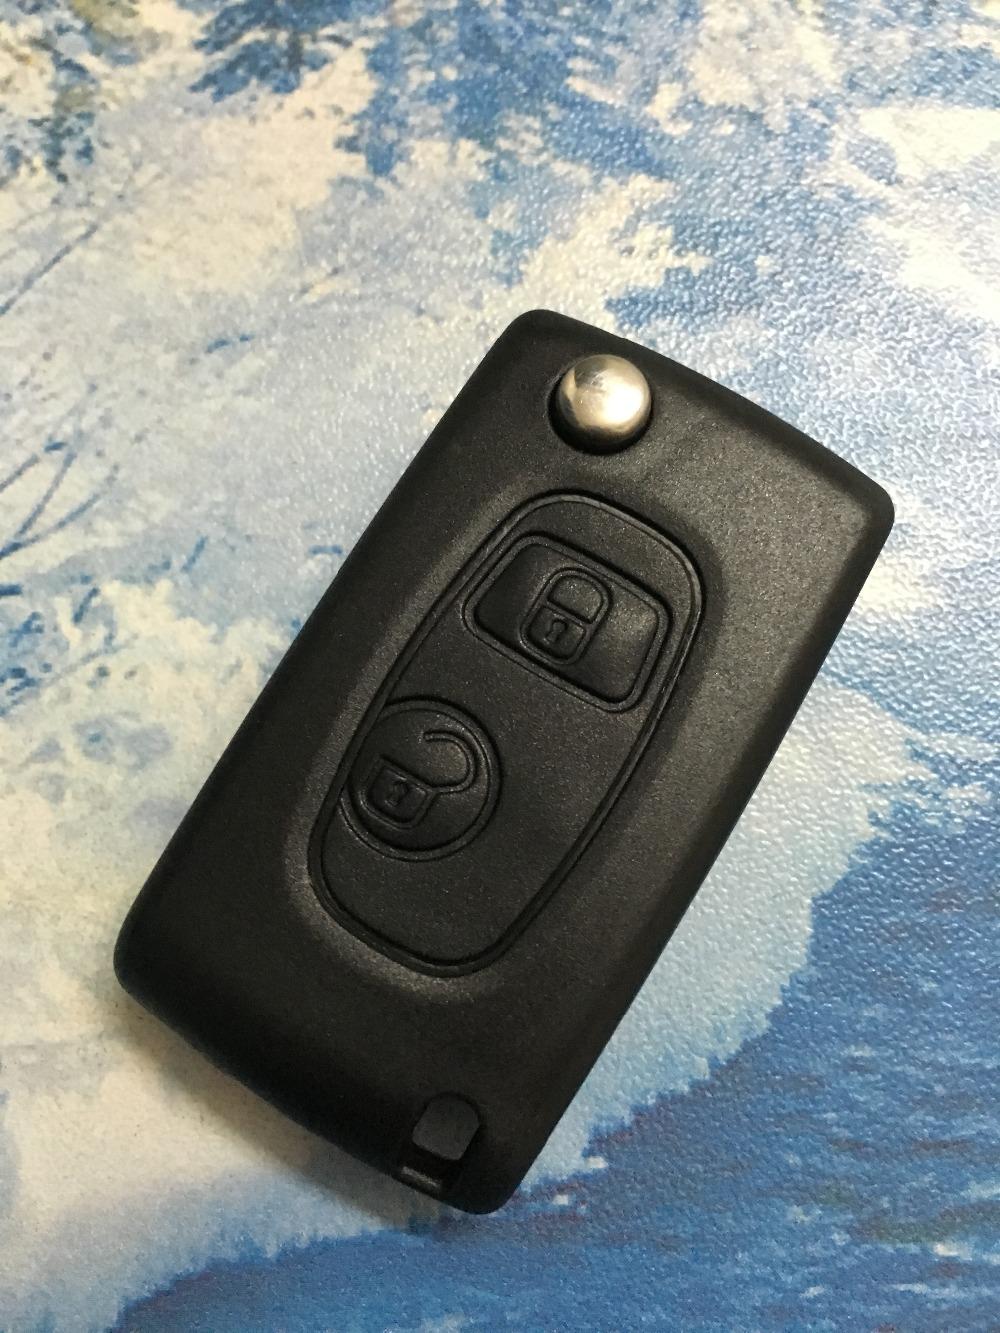 100% working free shipping 2 Buttons Modified Flip Remote Key Shell HU83 for Citroen